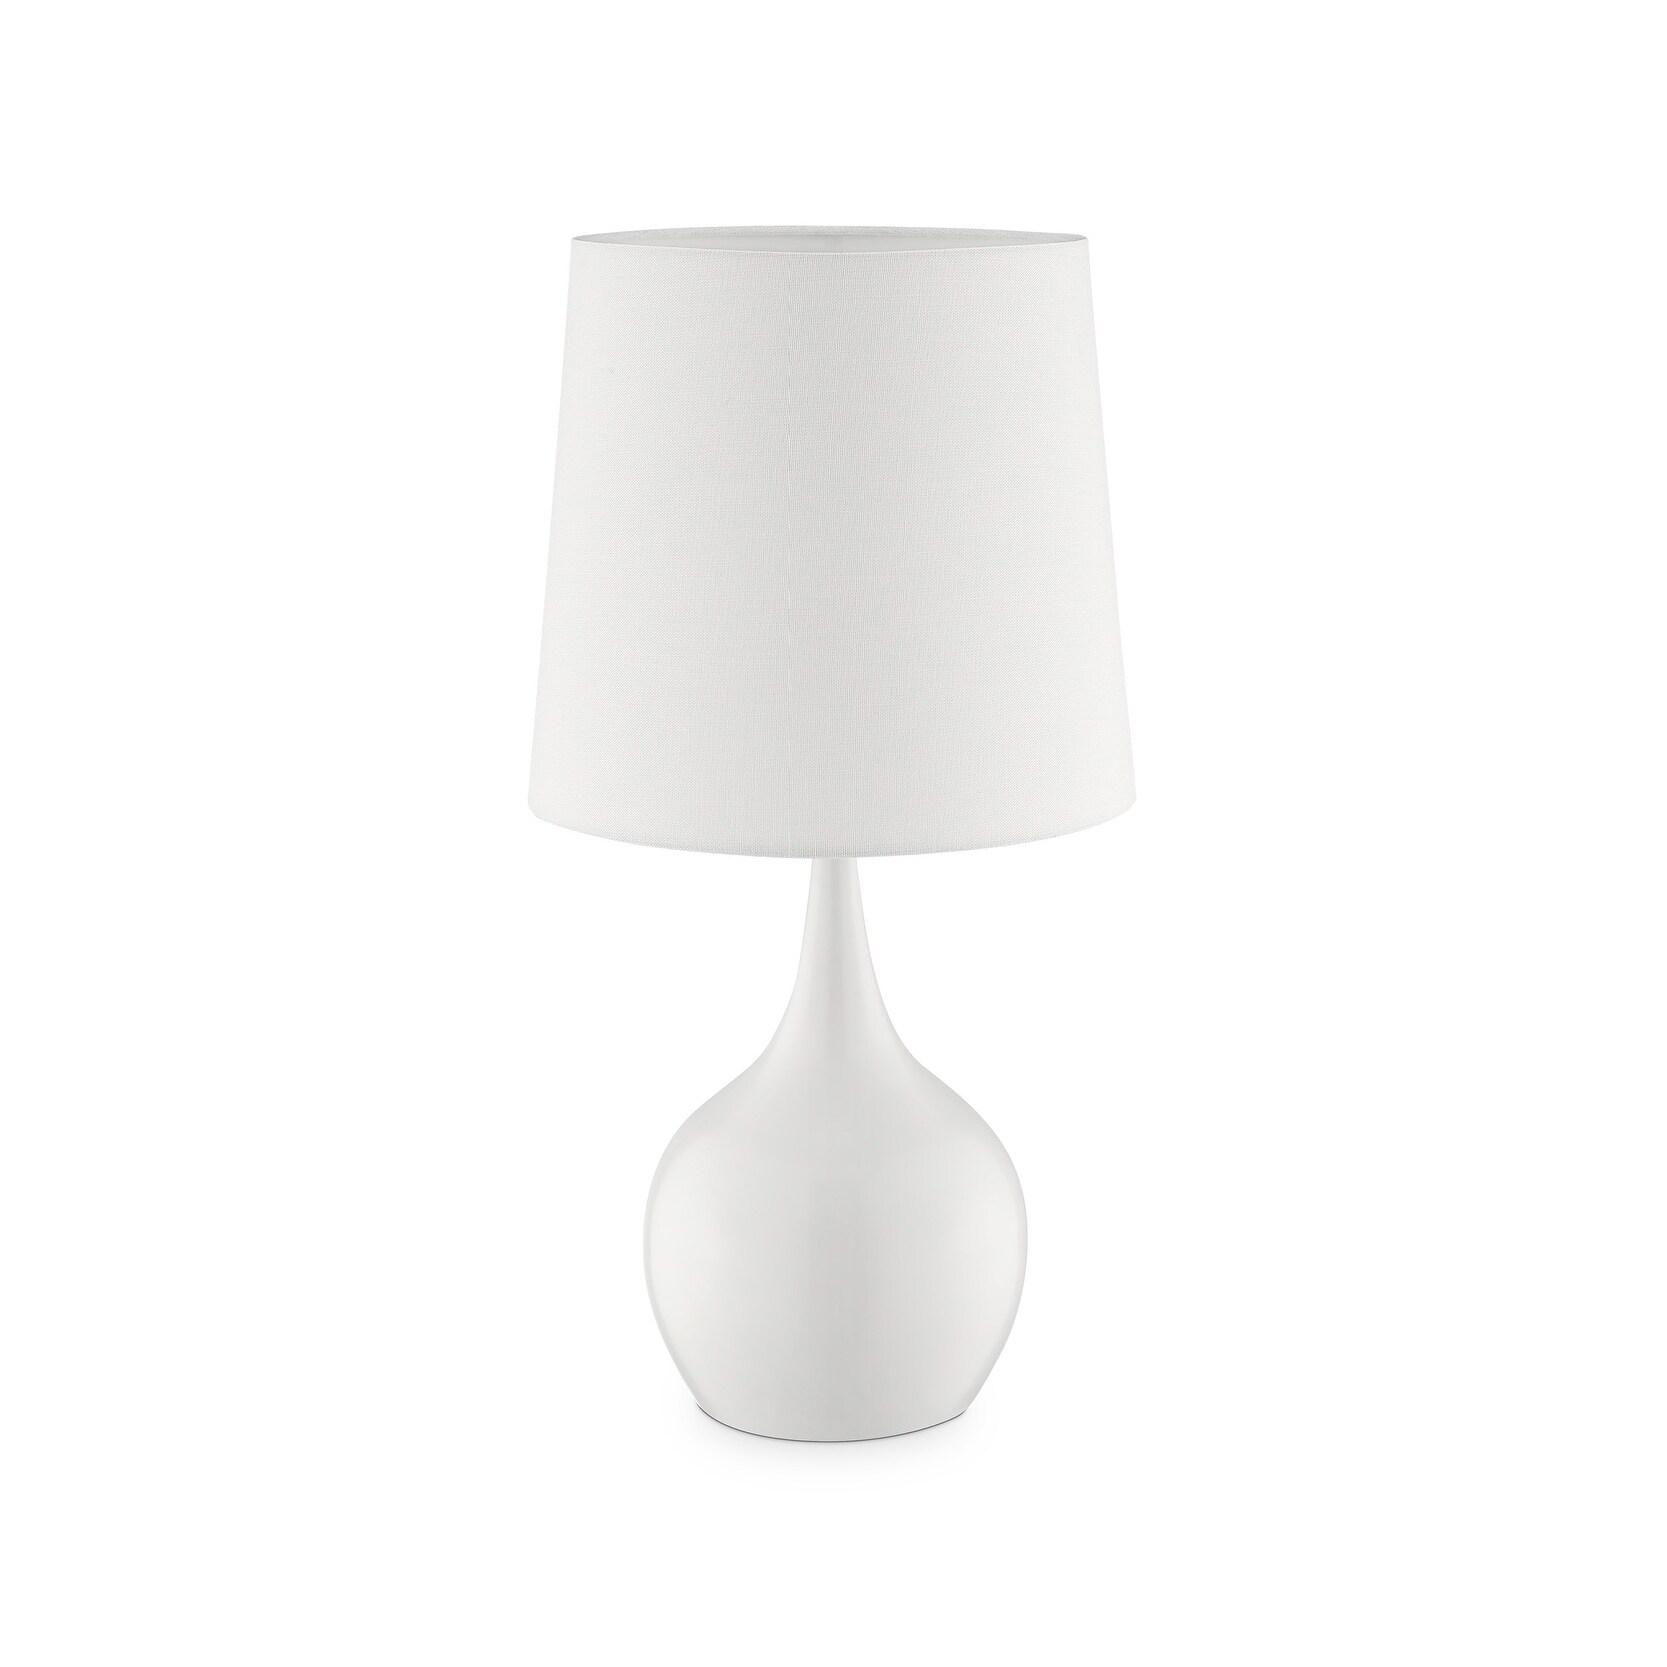 Niyor Mid Century Modern Touch Metal Table Lamp Overstock 23576849 Grey